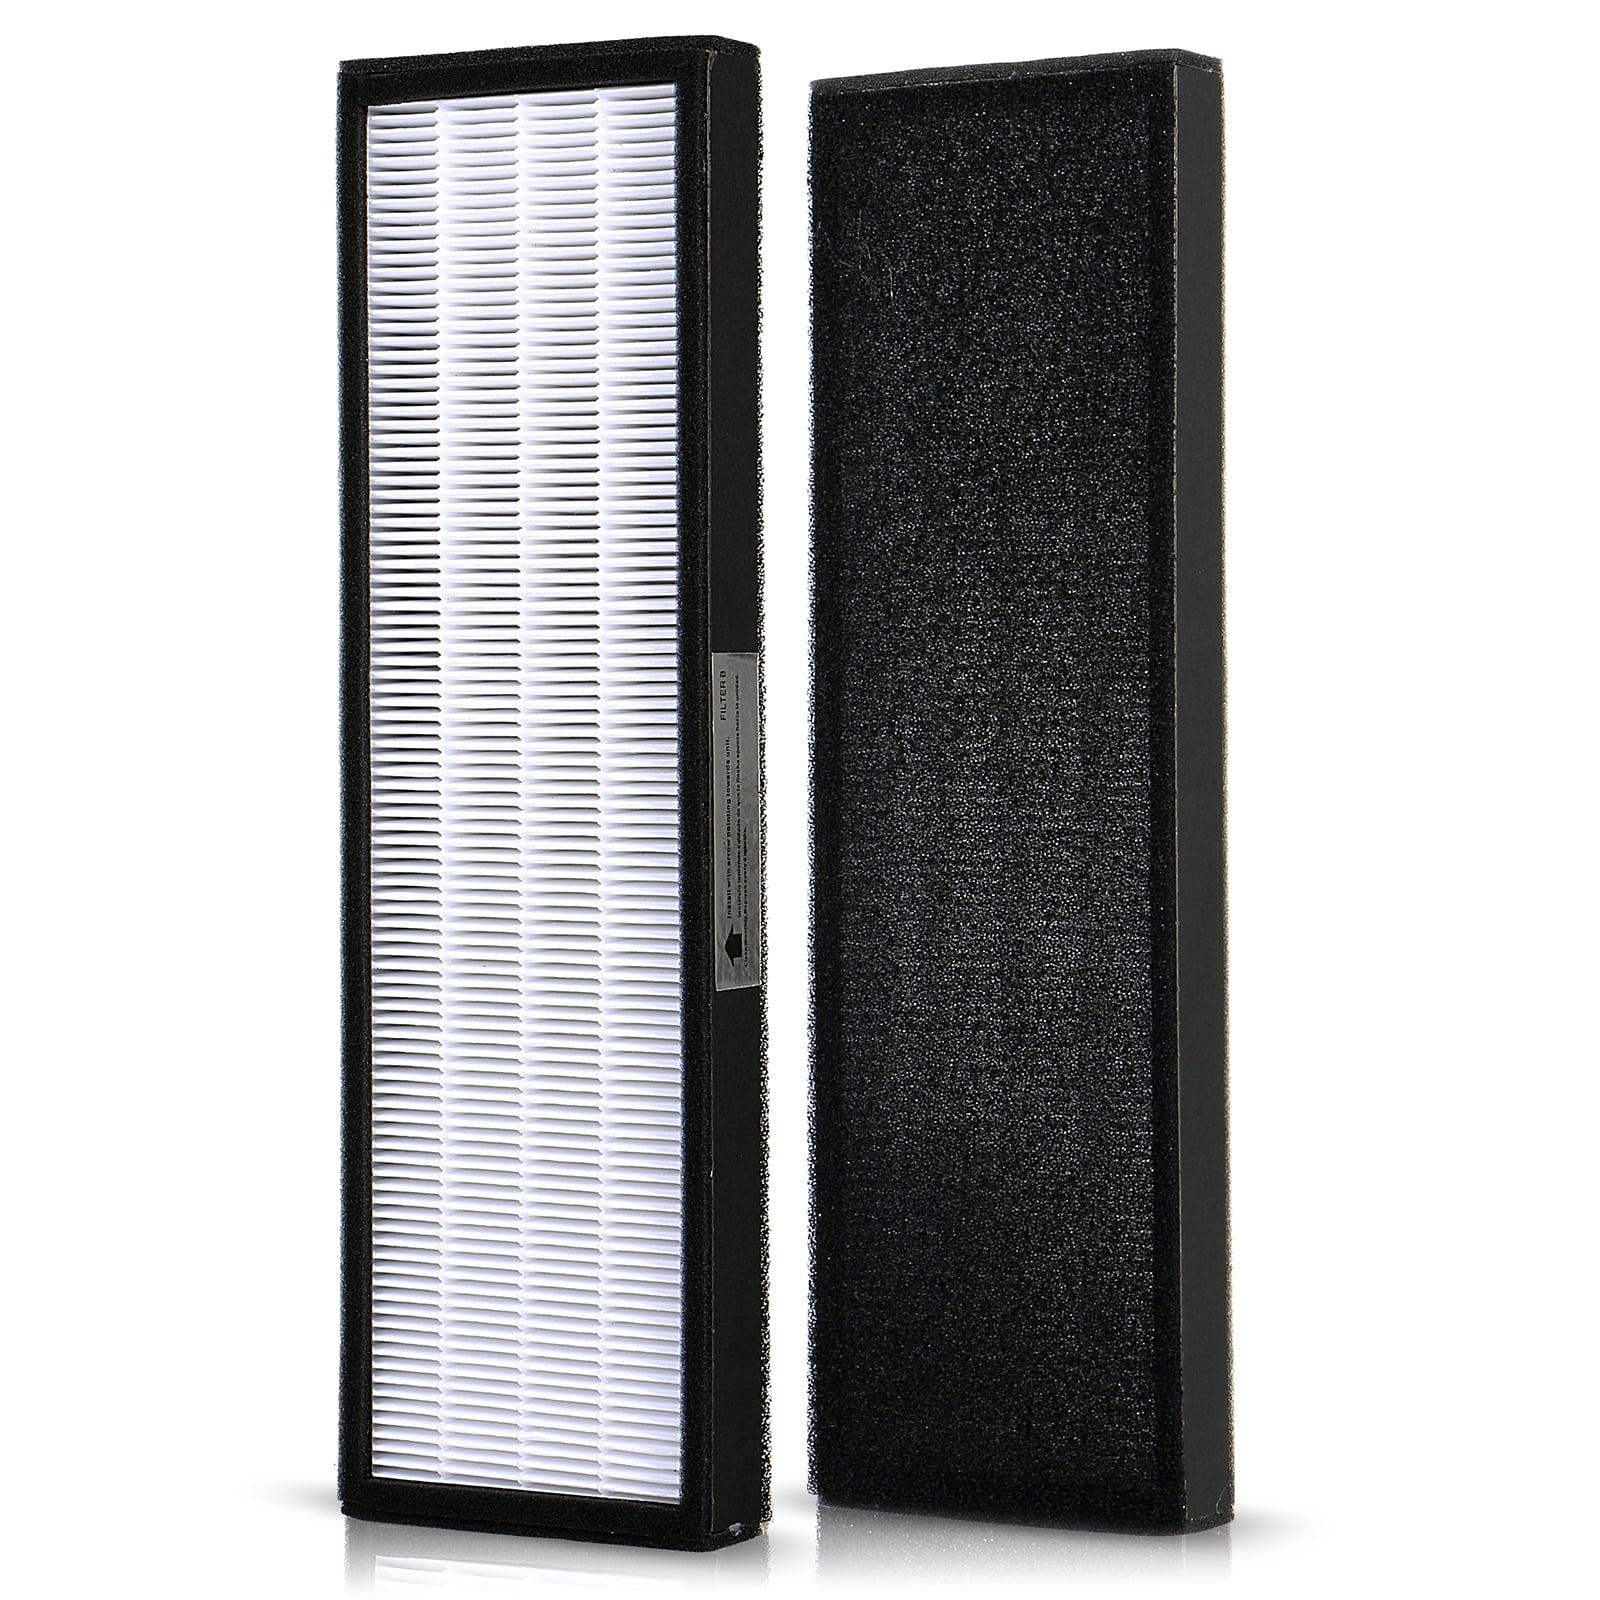 TSV True HEPA Filter B for GermGuardian FLT4825 FLT4800 Air Purifiers AC4300 AC4800 AC4900 AC4900CA AC4825 AC4825e AC4850PT, PureGuardian AP2200CA, Black & Decker BXFLTY BXAP148